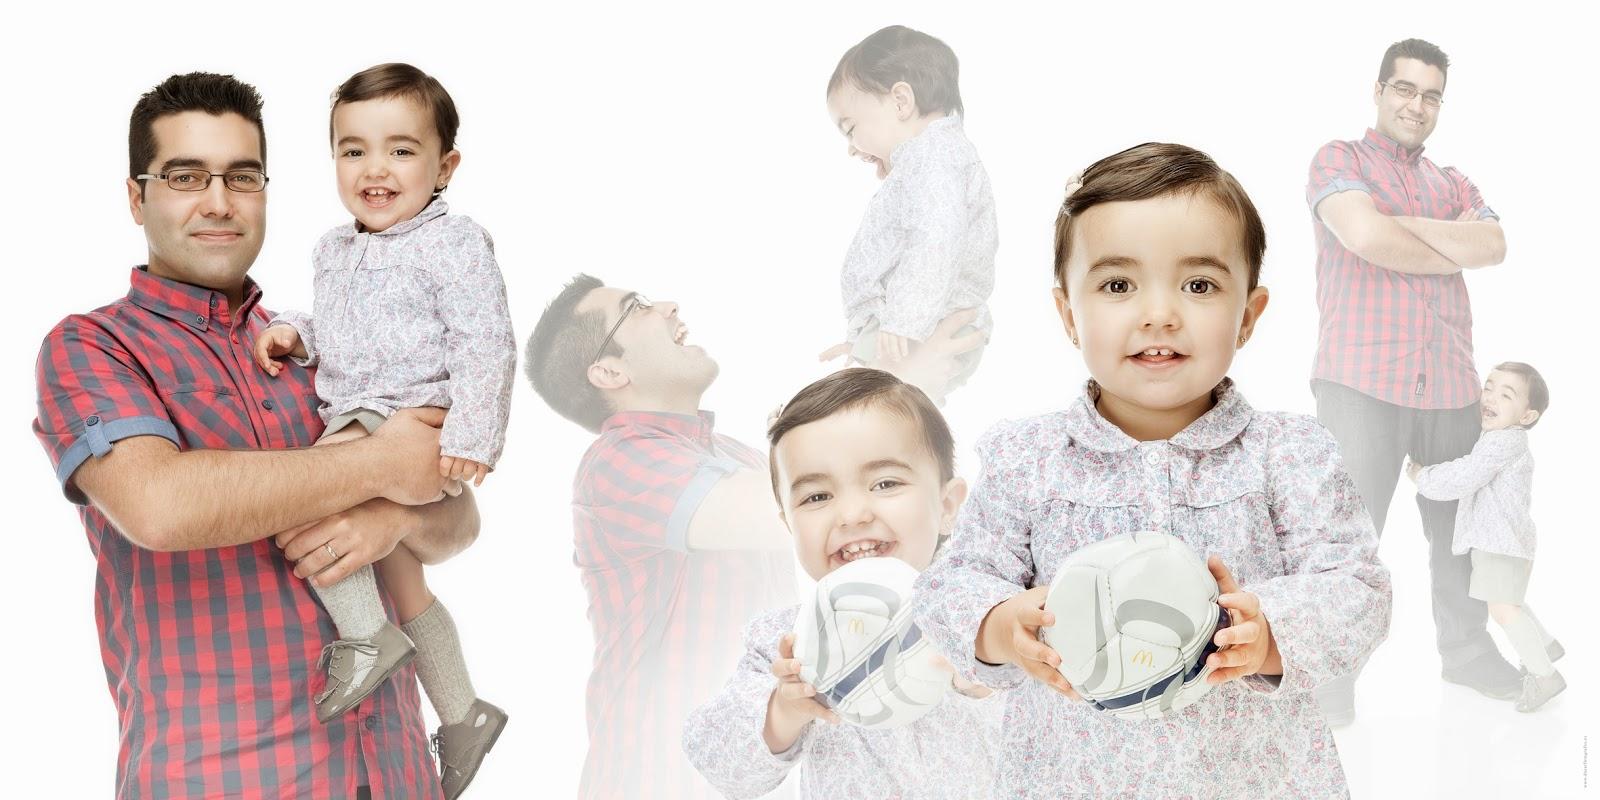 Sesion de estudio infantil en dacarfotografos, Asturias. Fotografos asturianos en Villaviciosa para toda Asturias, Villaviciosa, Colunga, Llastres, Caravia, Ribadesella, Cangas de Onis, Arriondas, Nava, Gijon, Oviedo. Fotografia divertida, sesiones entretenidas, recuerdos, belleza, sonrisa. Segimientos infantiles. Te esperamos.